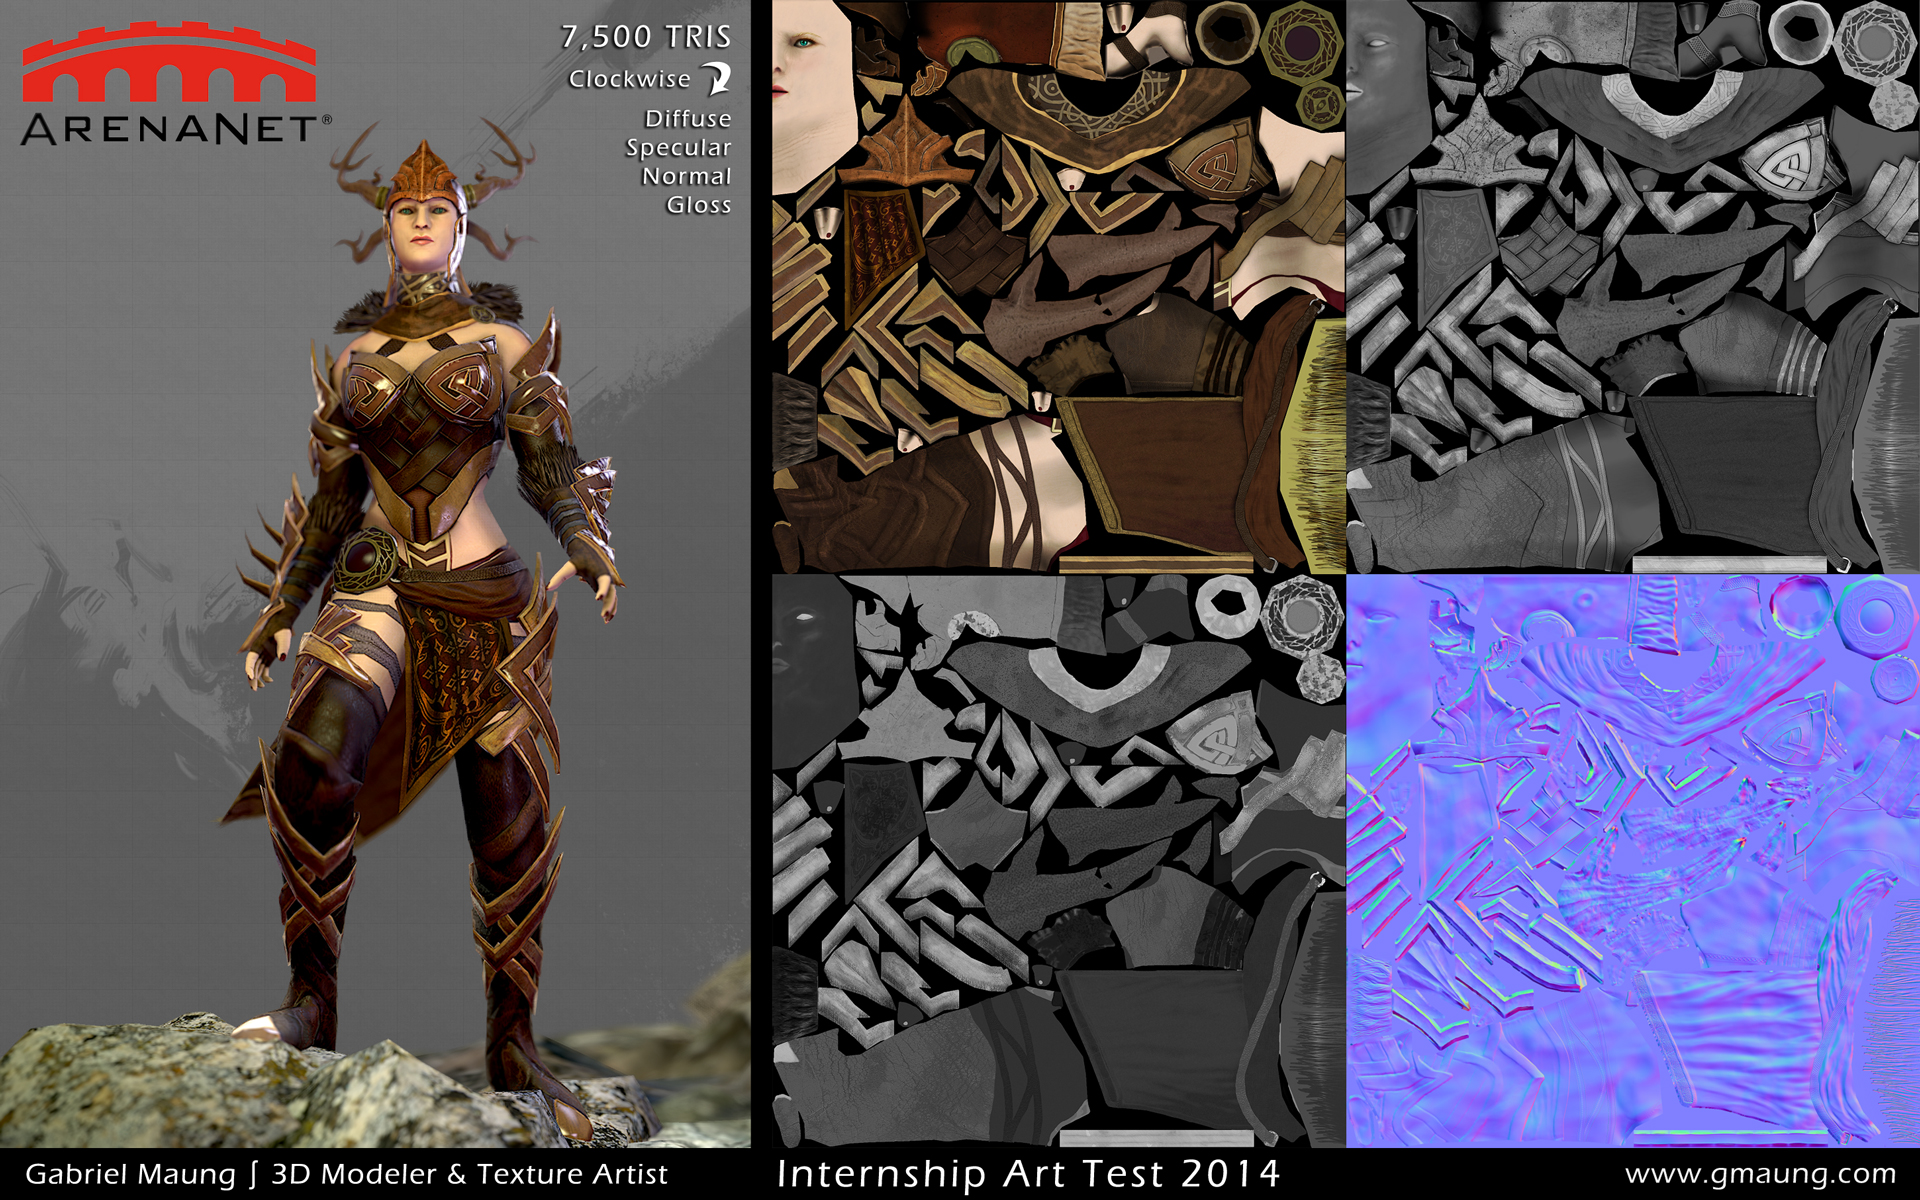 Arenanet-Character-Internship-Norn-Guild-Wars-Norn-Texture-Presentation